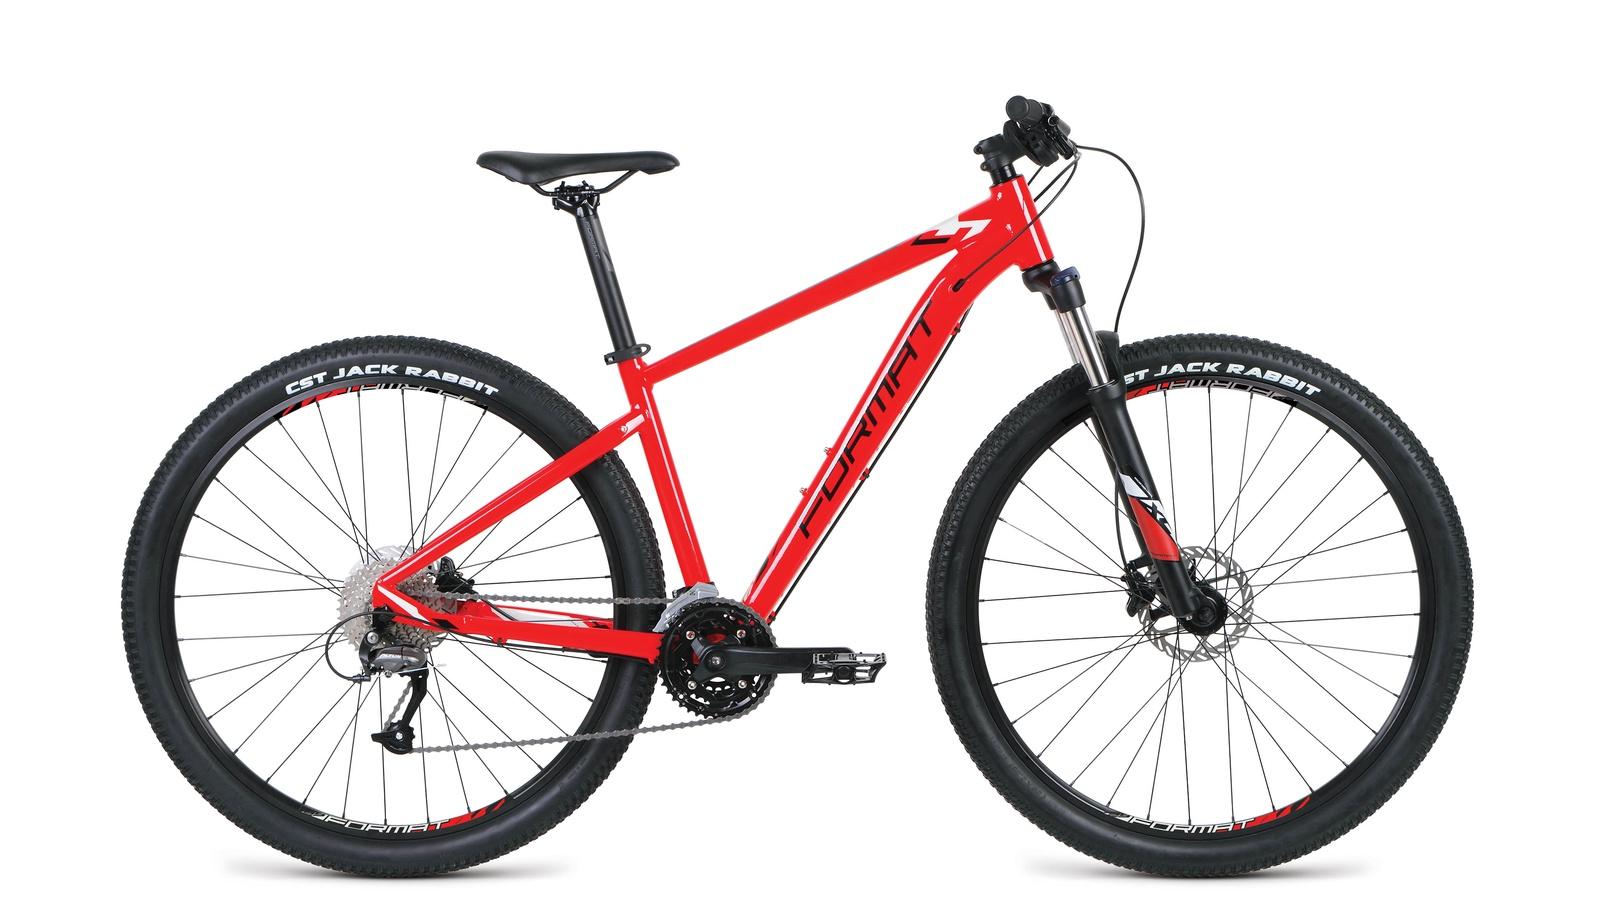 Велосипед Format RBKM9M69S017, красный велосипед format 1413 29 2017